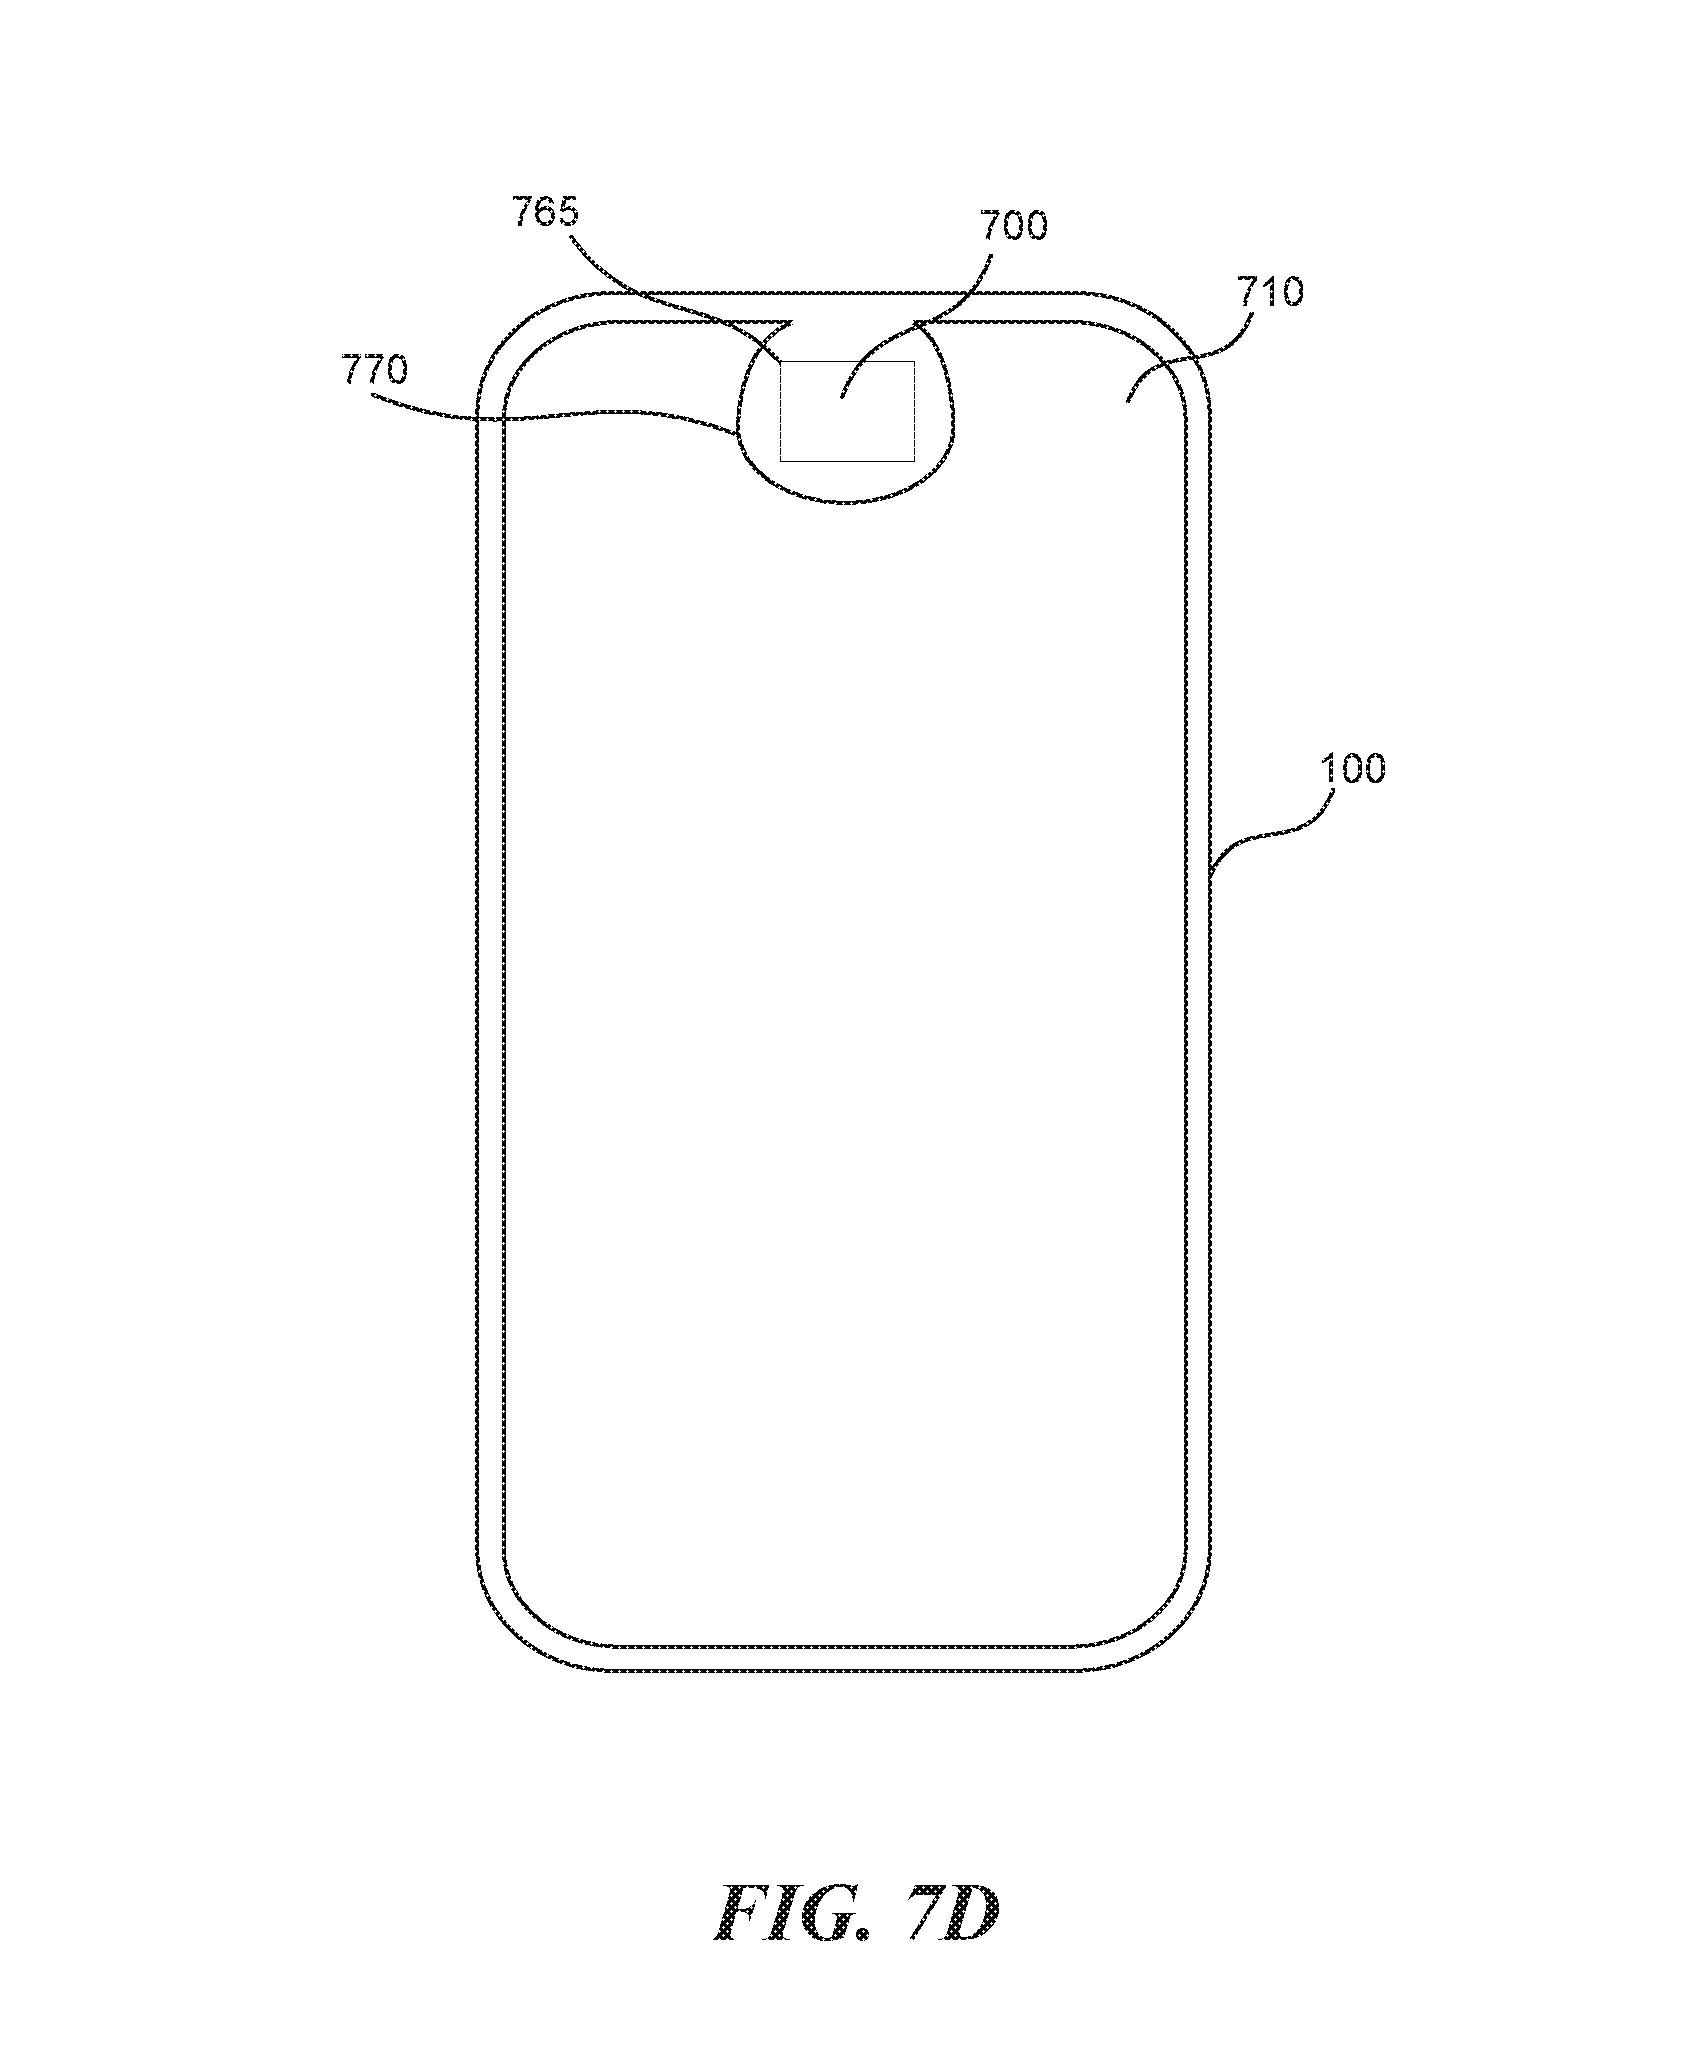 Essential Pop up Camera Patent 22